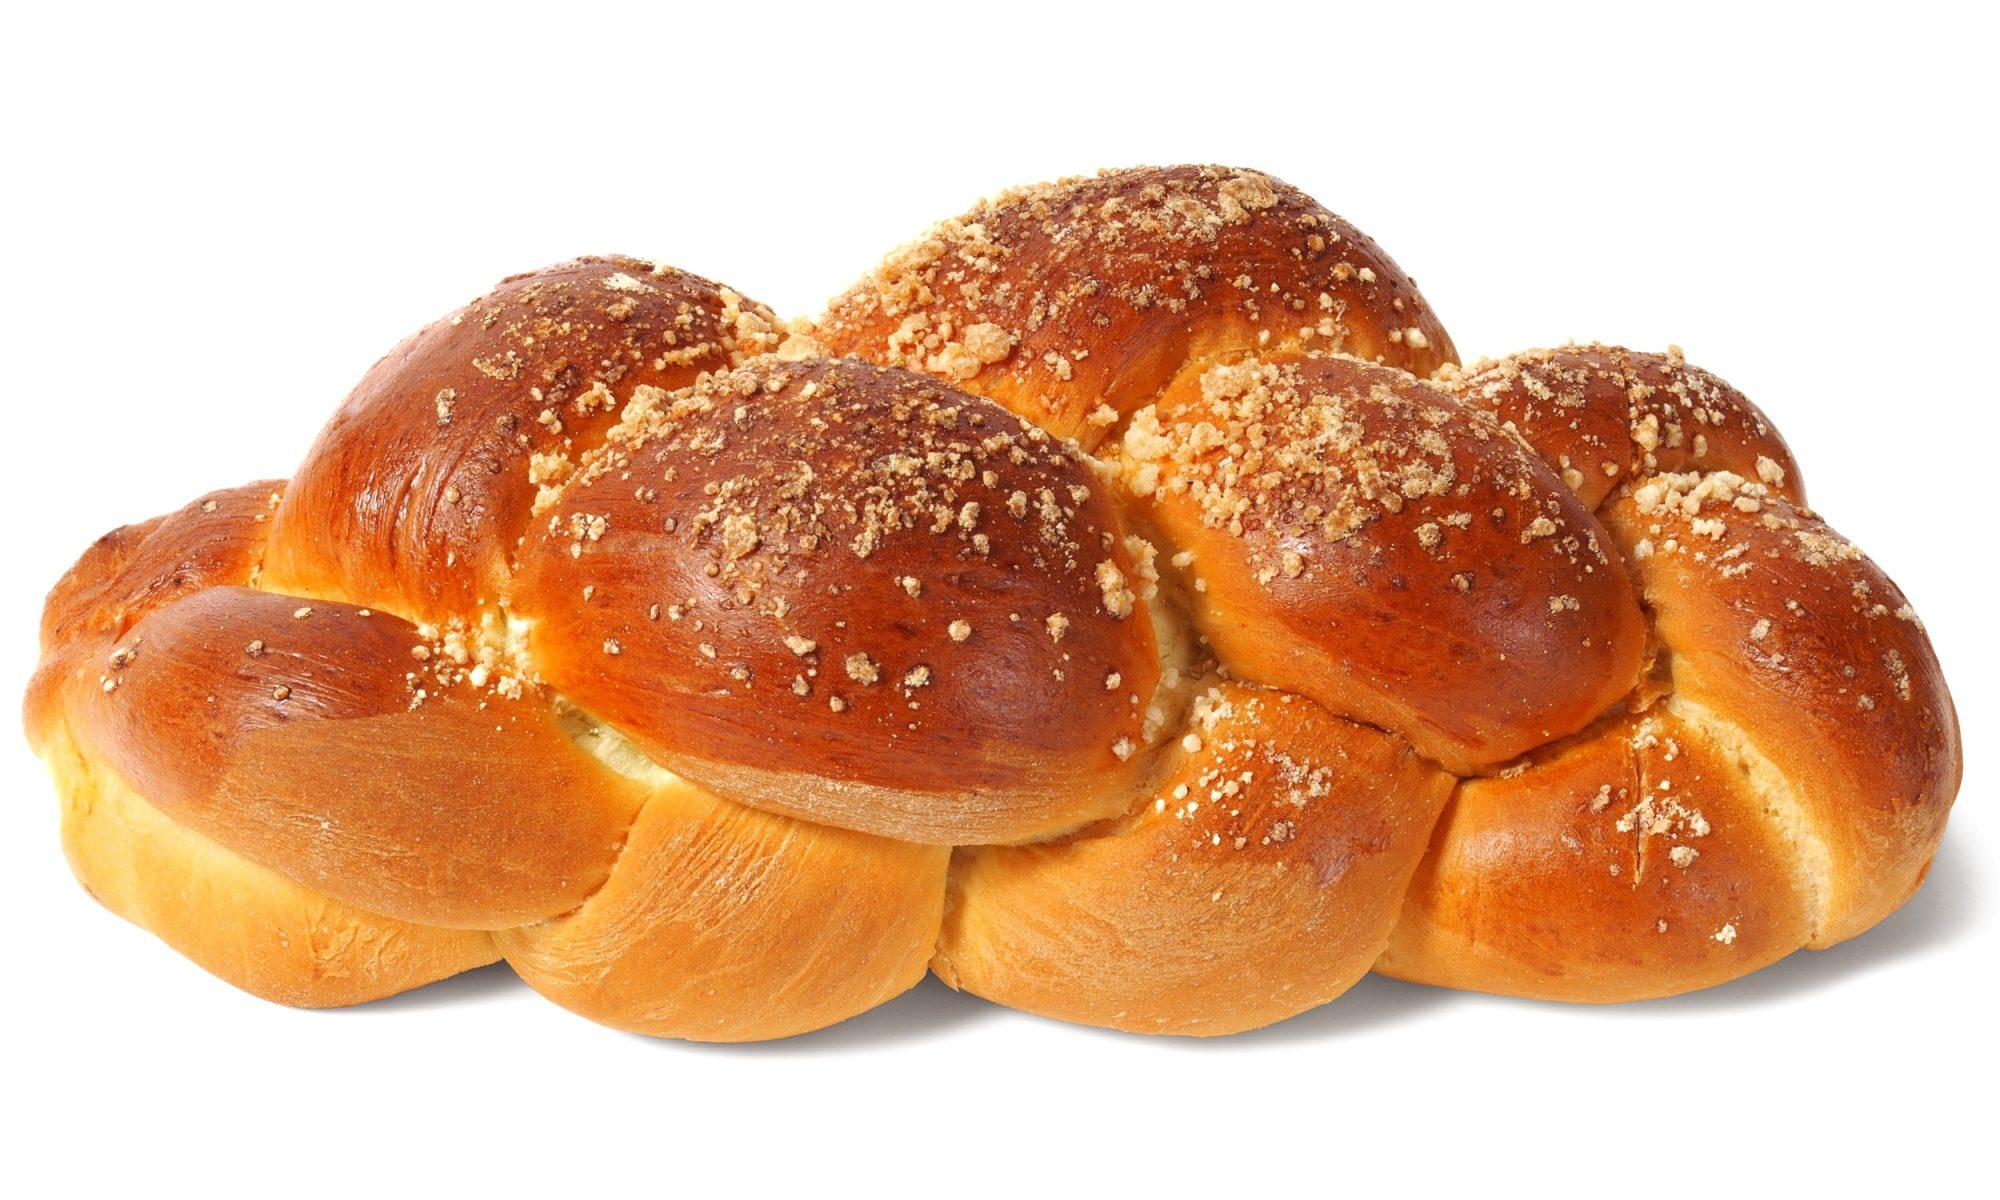 EC: Challah Bread Tastes Like a Big Hug